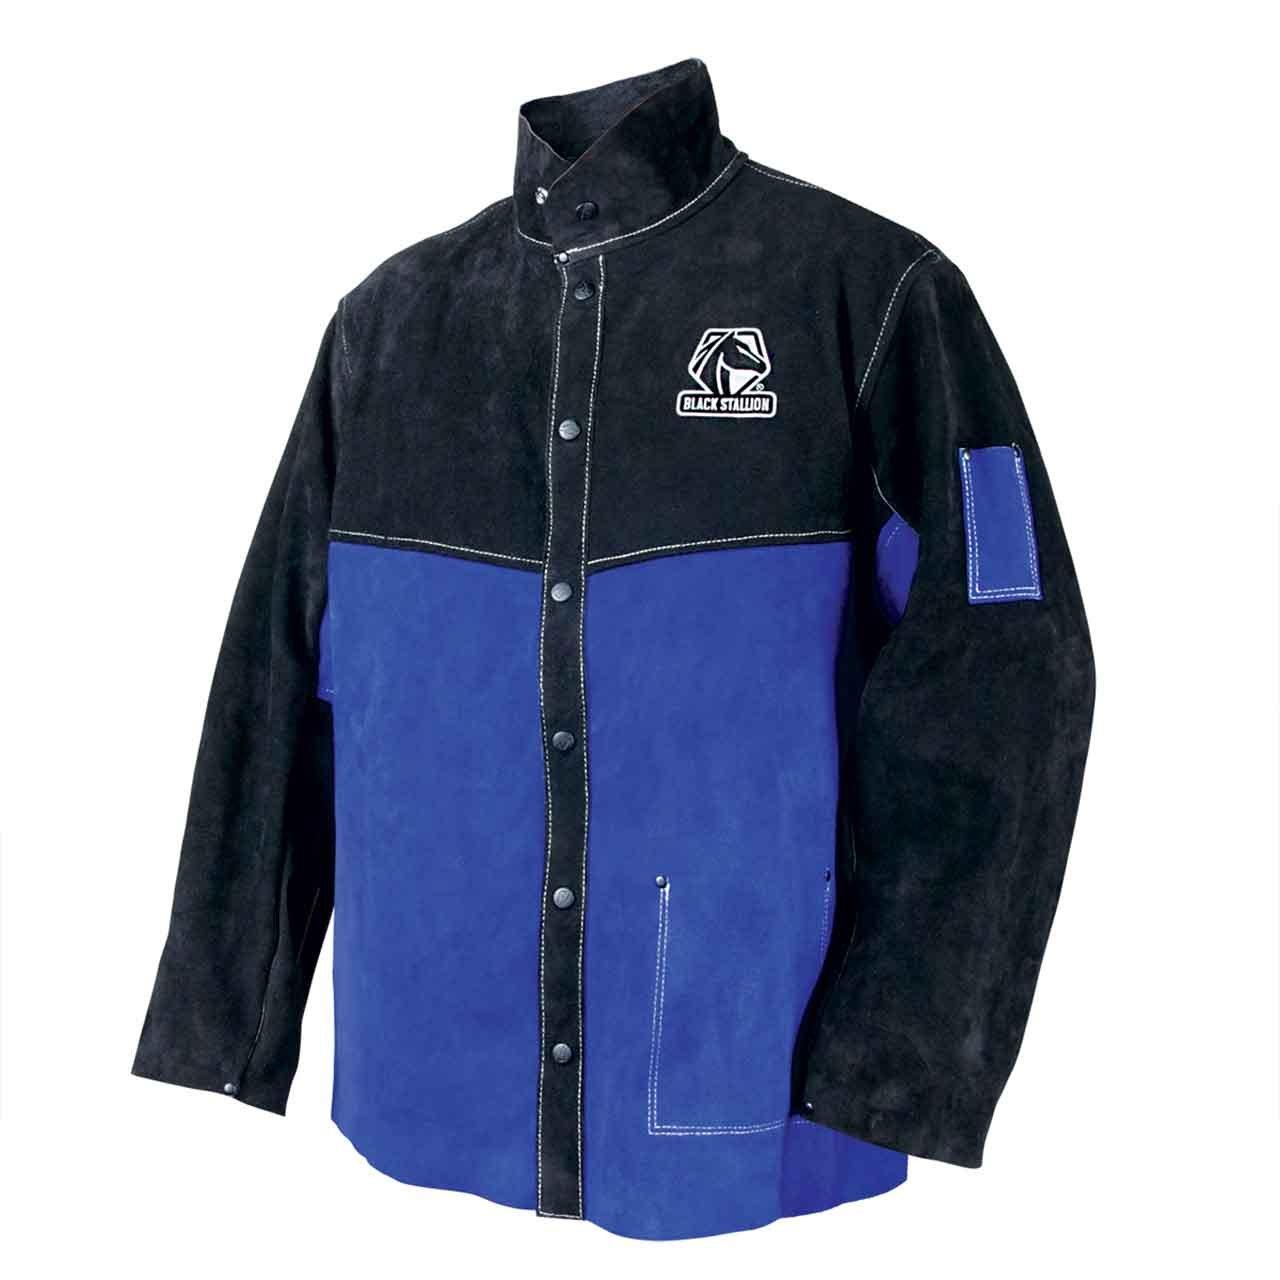 Black Stallion JL1030-BB Color Block Leather Welding Jacket, X-Large by Black Stallion